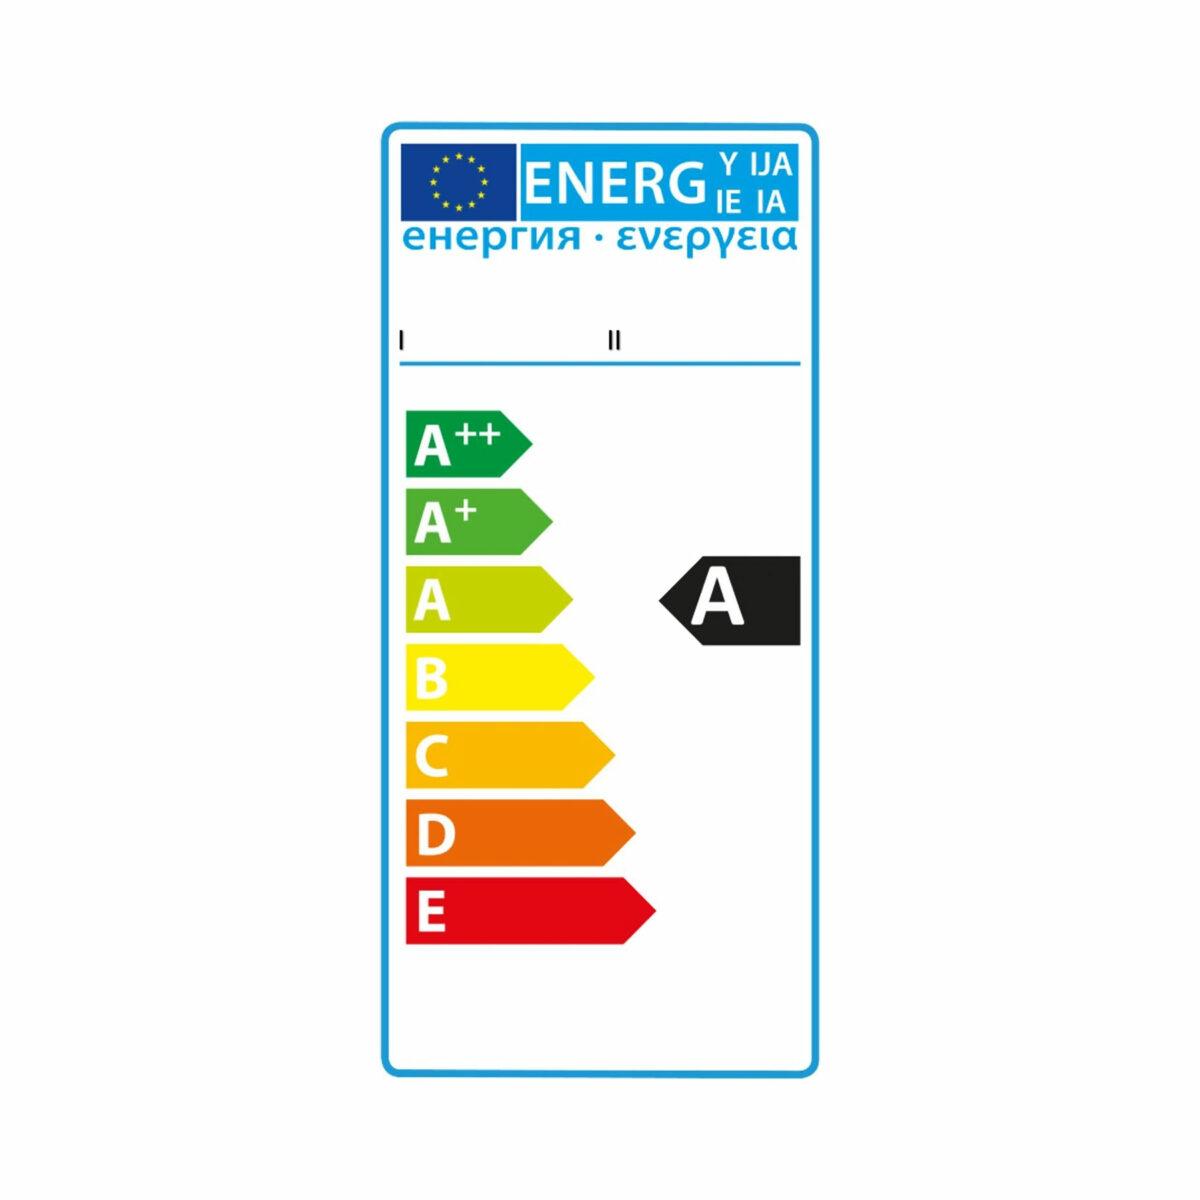 6watt MR16 LED 12volt GU5.3 Cap Warm White Equivalent To 35watt 36 Degree Dimmable